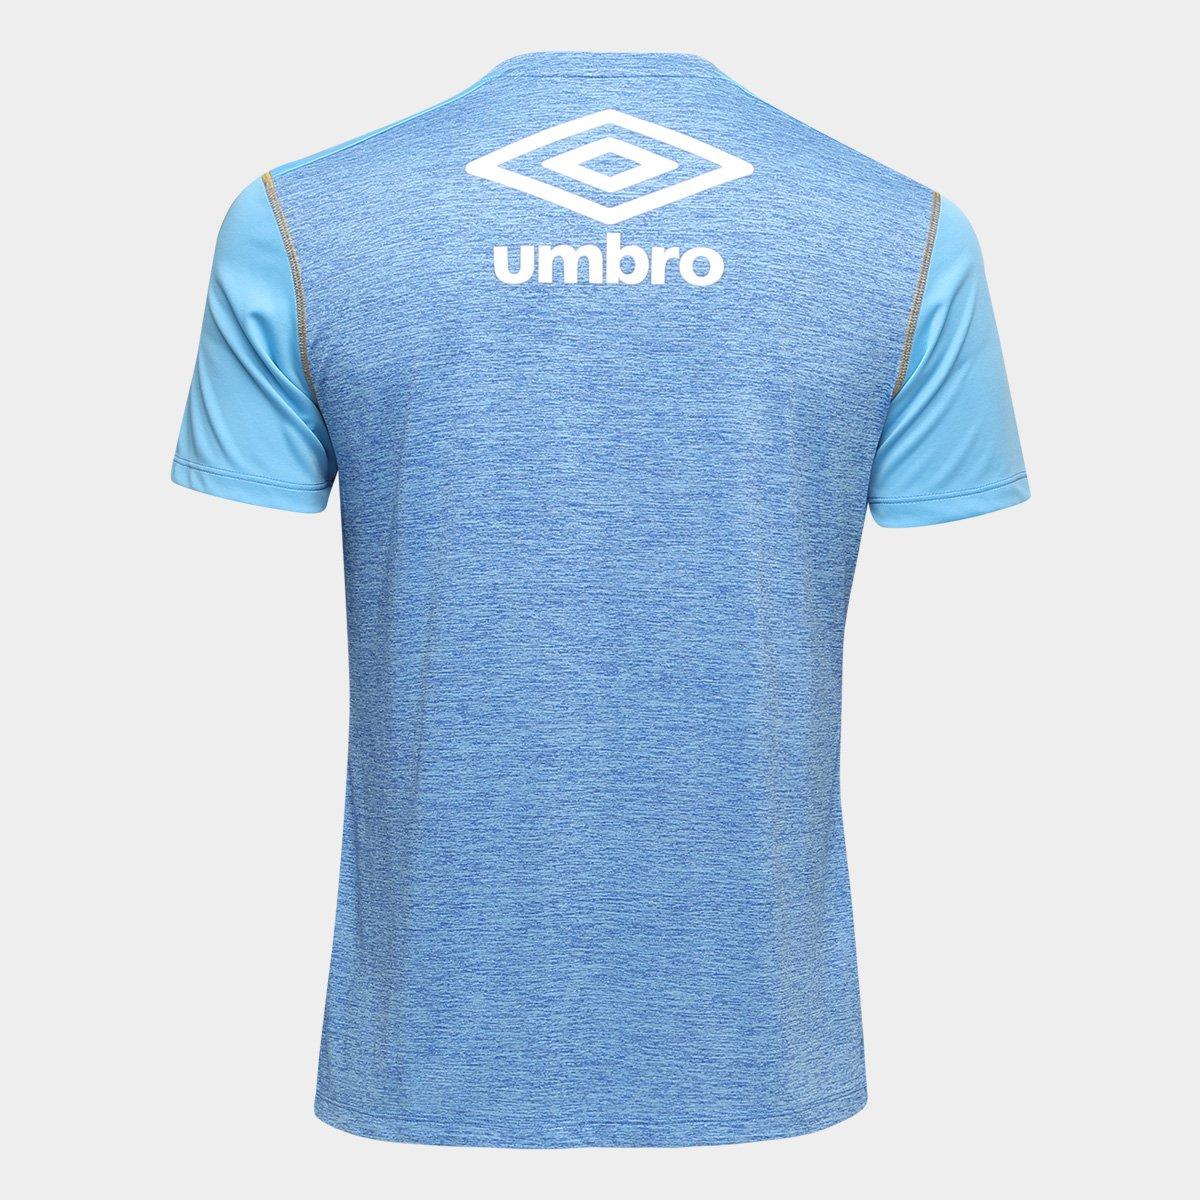 Camisa Avaí 2019 Aquecimento Umbro Masculina - 1